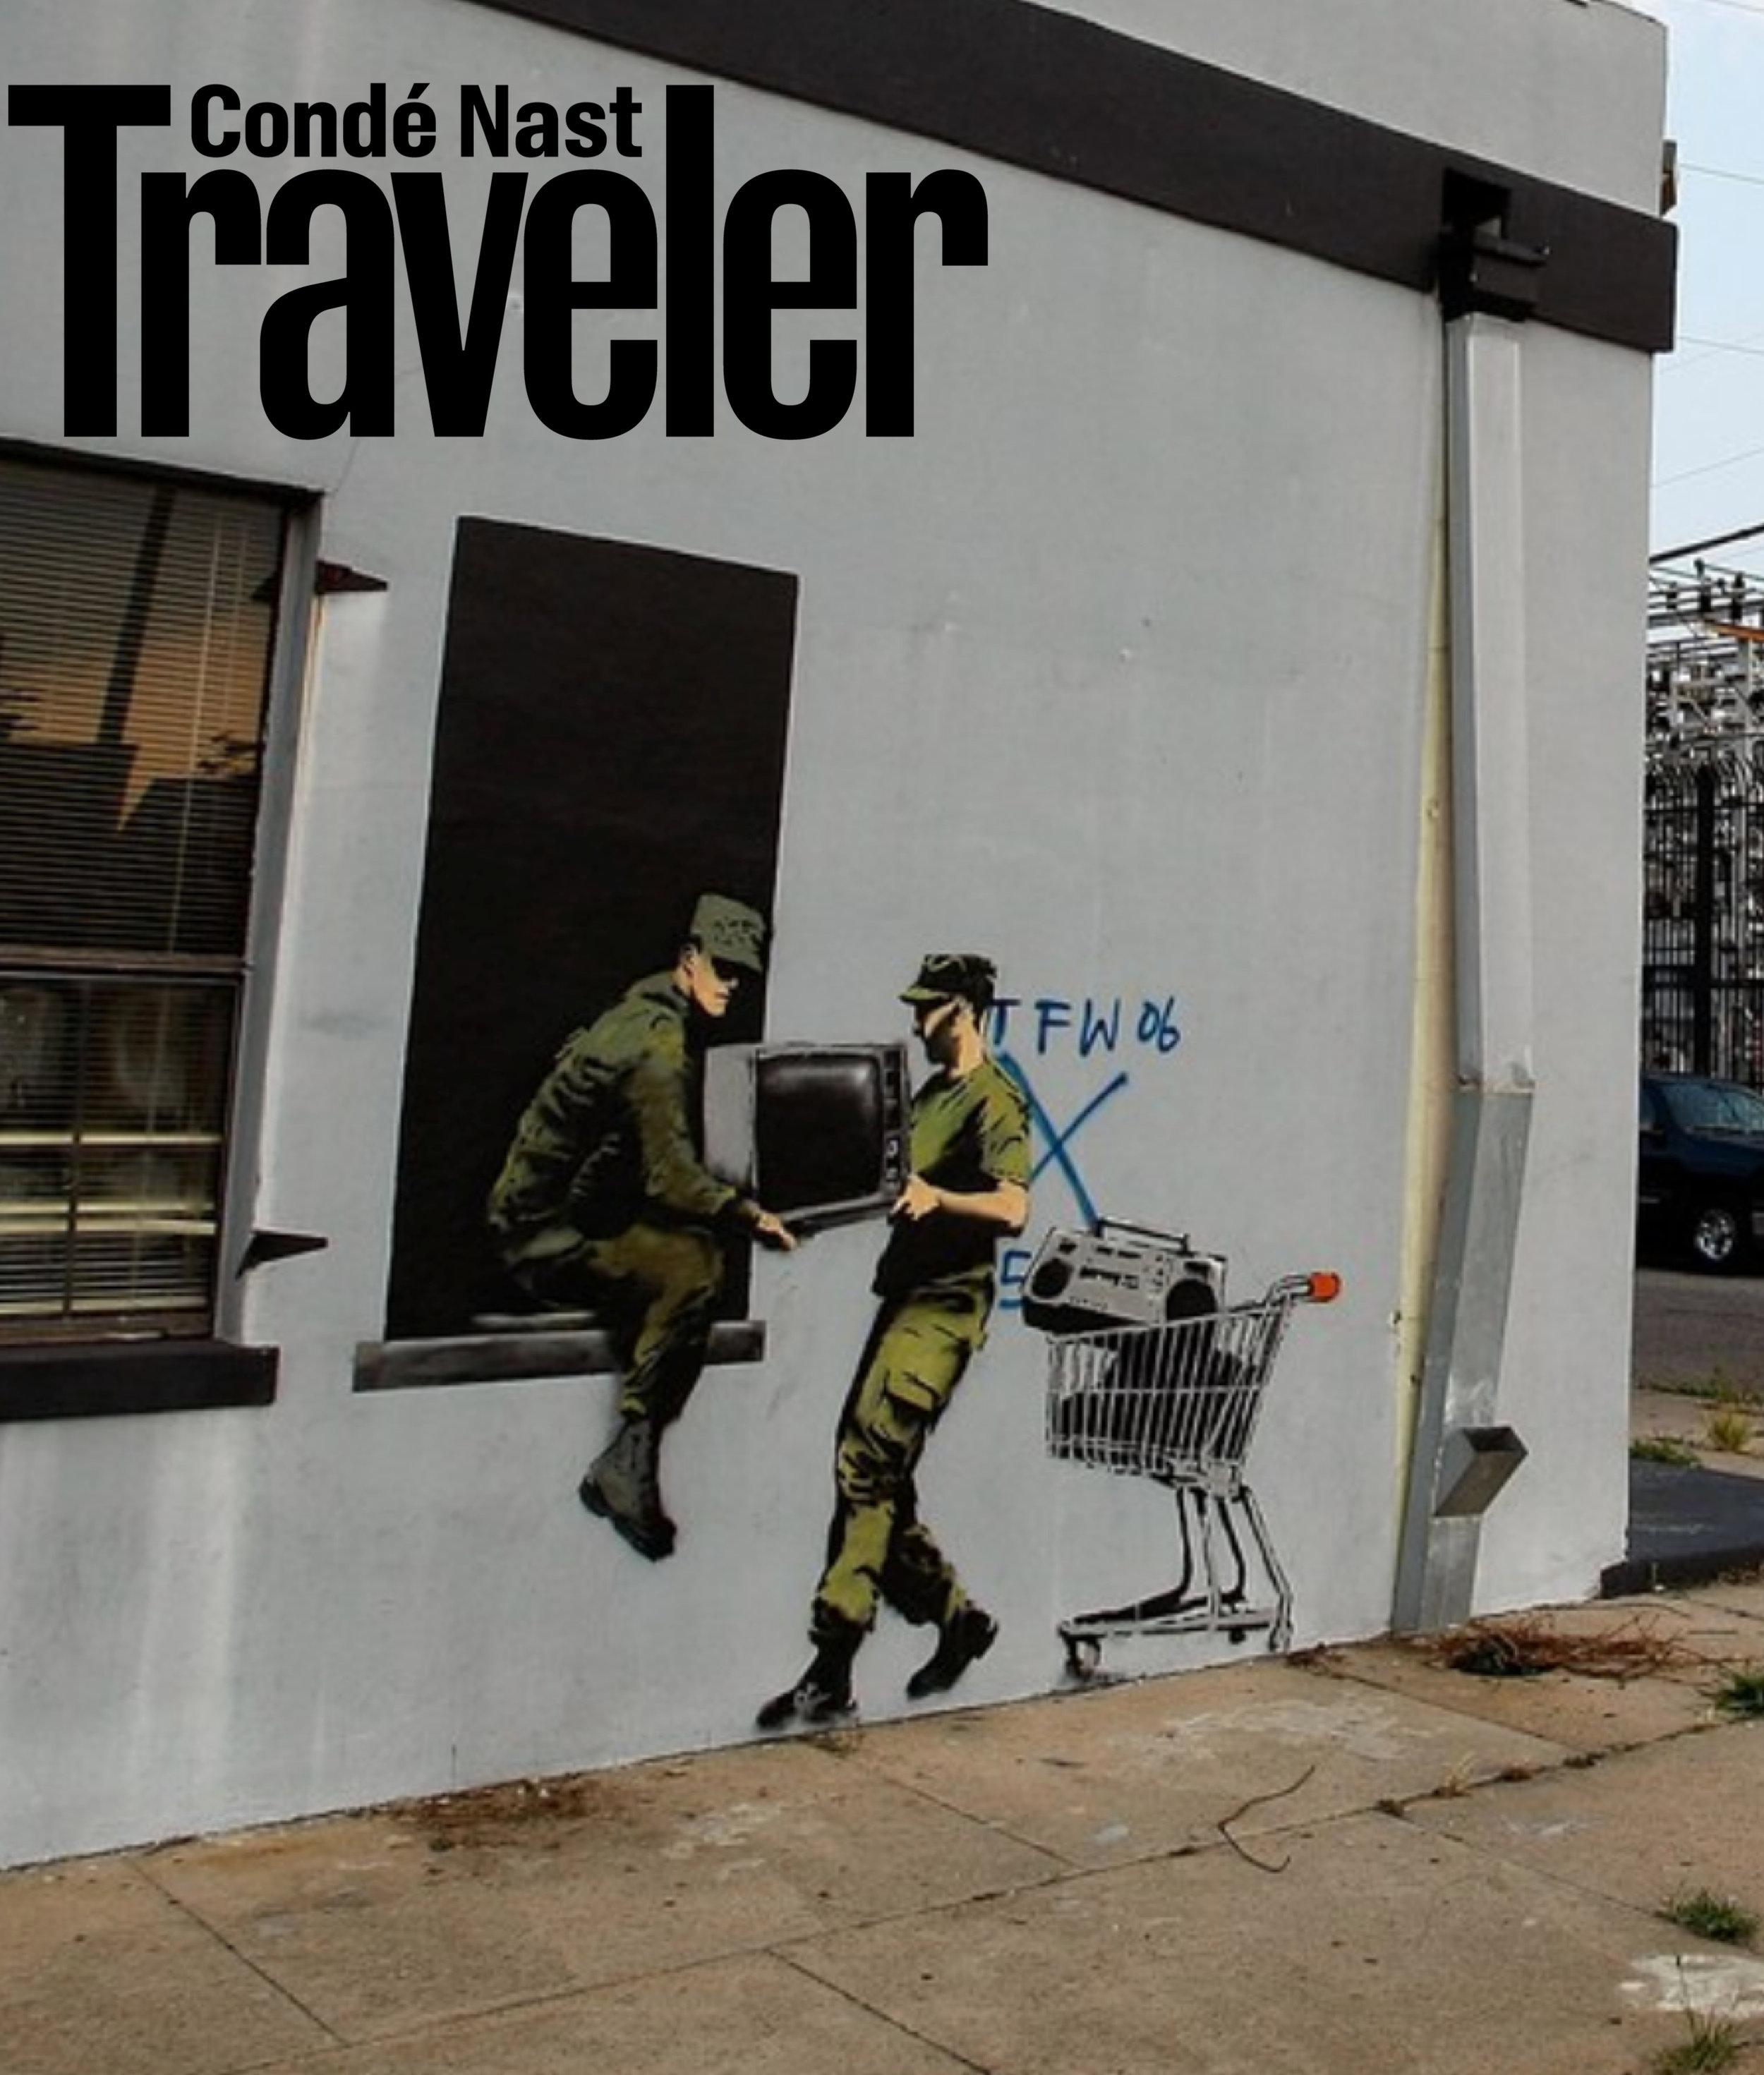 Conde Nast Traveler.001.jpg